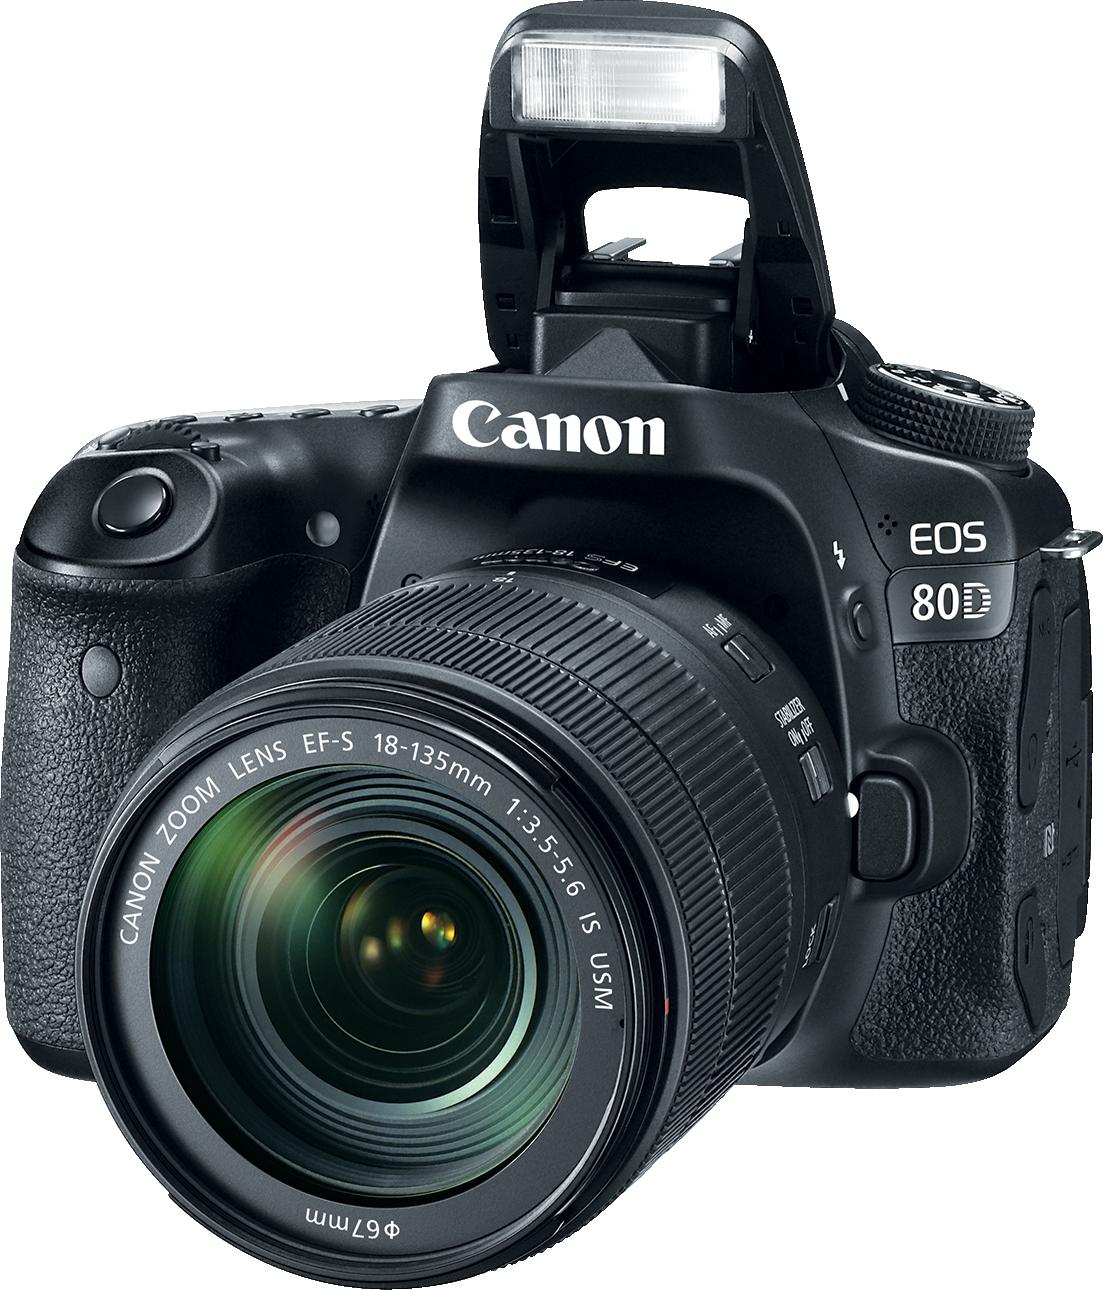 canon eos 80d digital photography review iMac G2 iMac G2